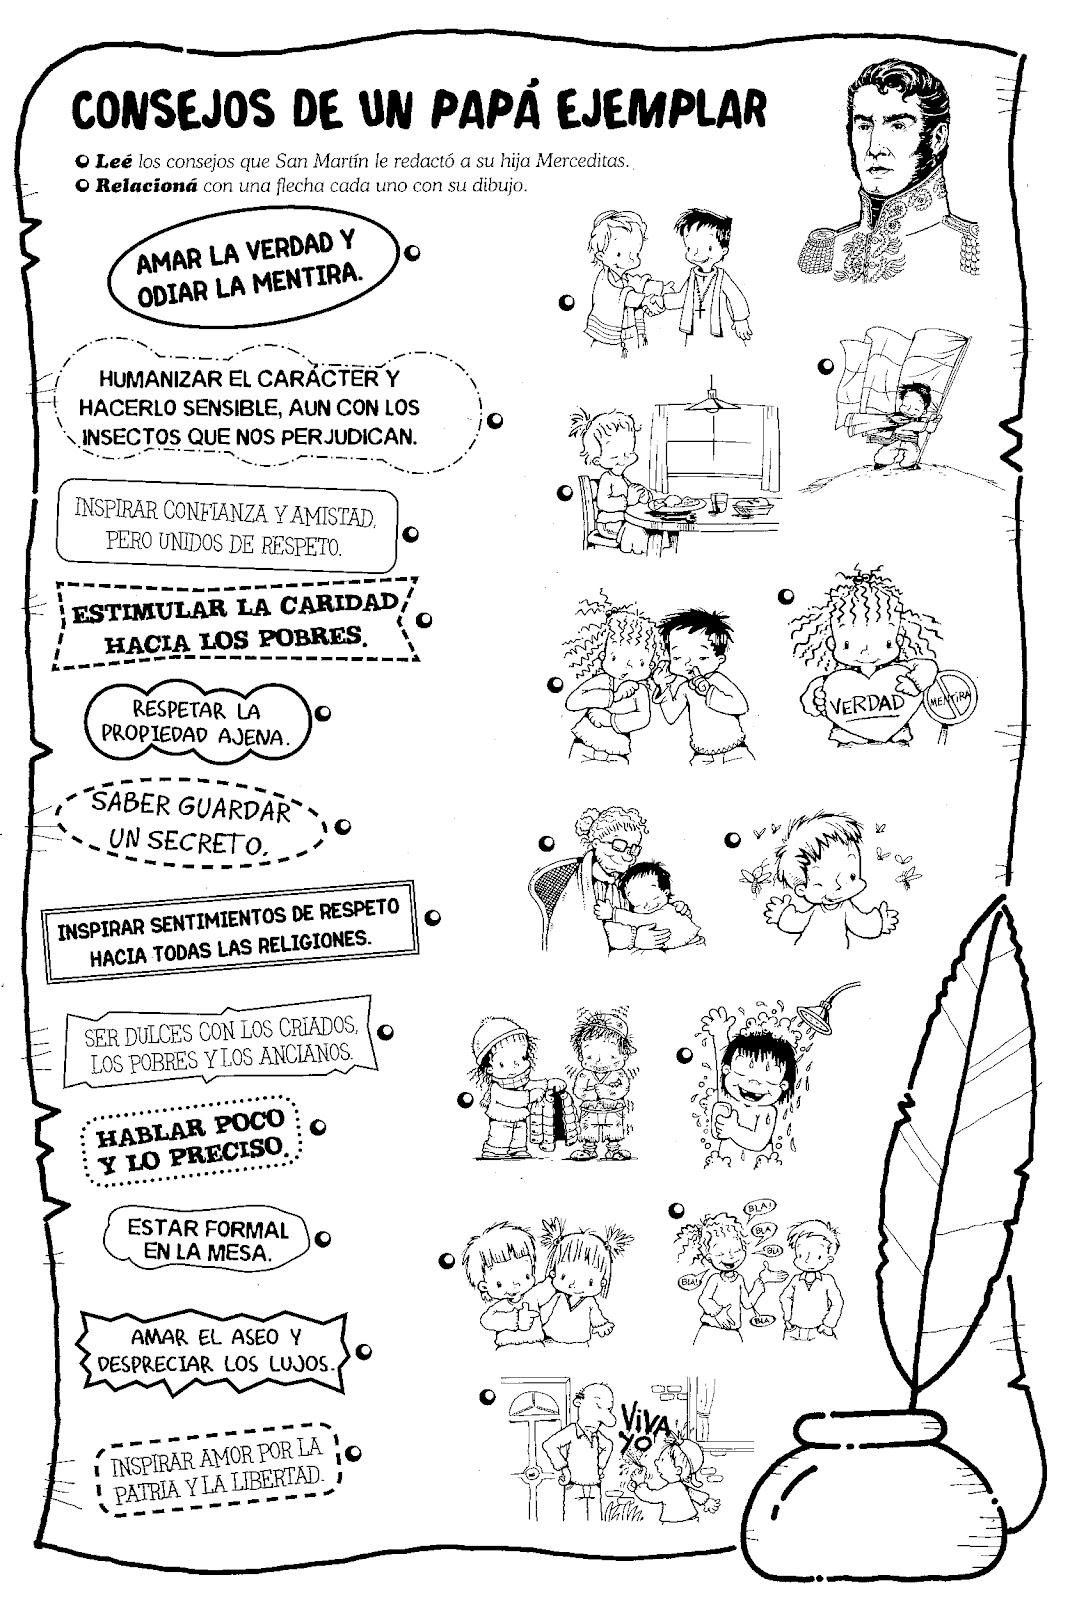 Mis Pasitos por Primero : 07/01/2012 - 08/01/2012